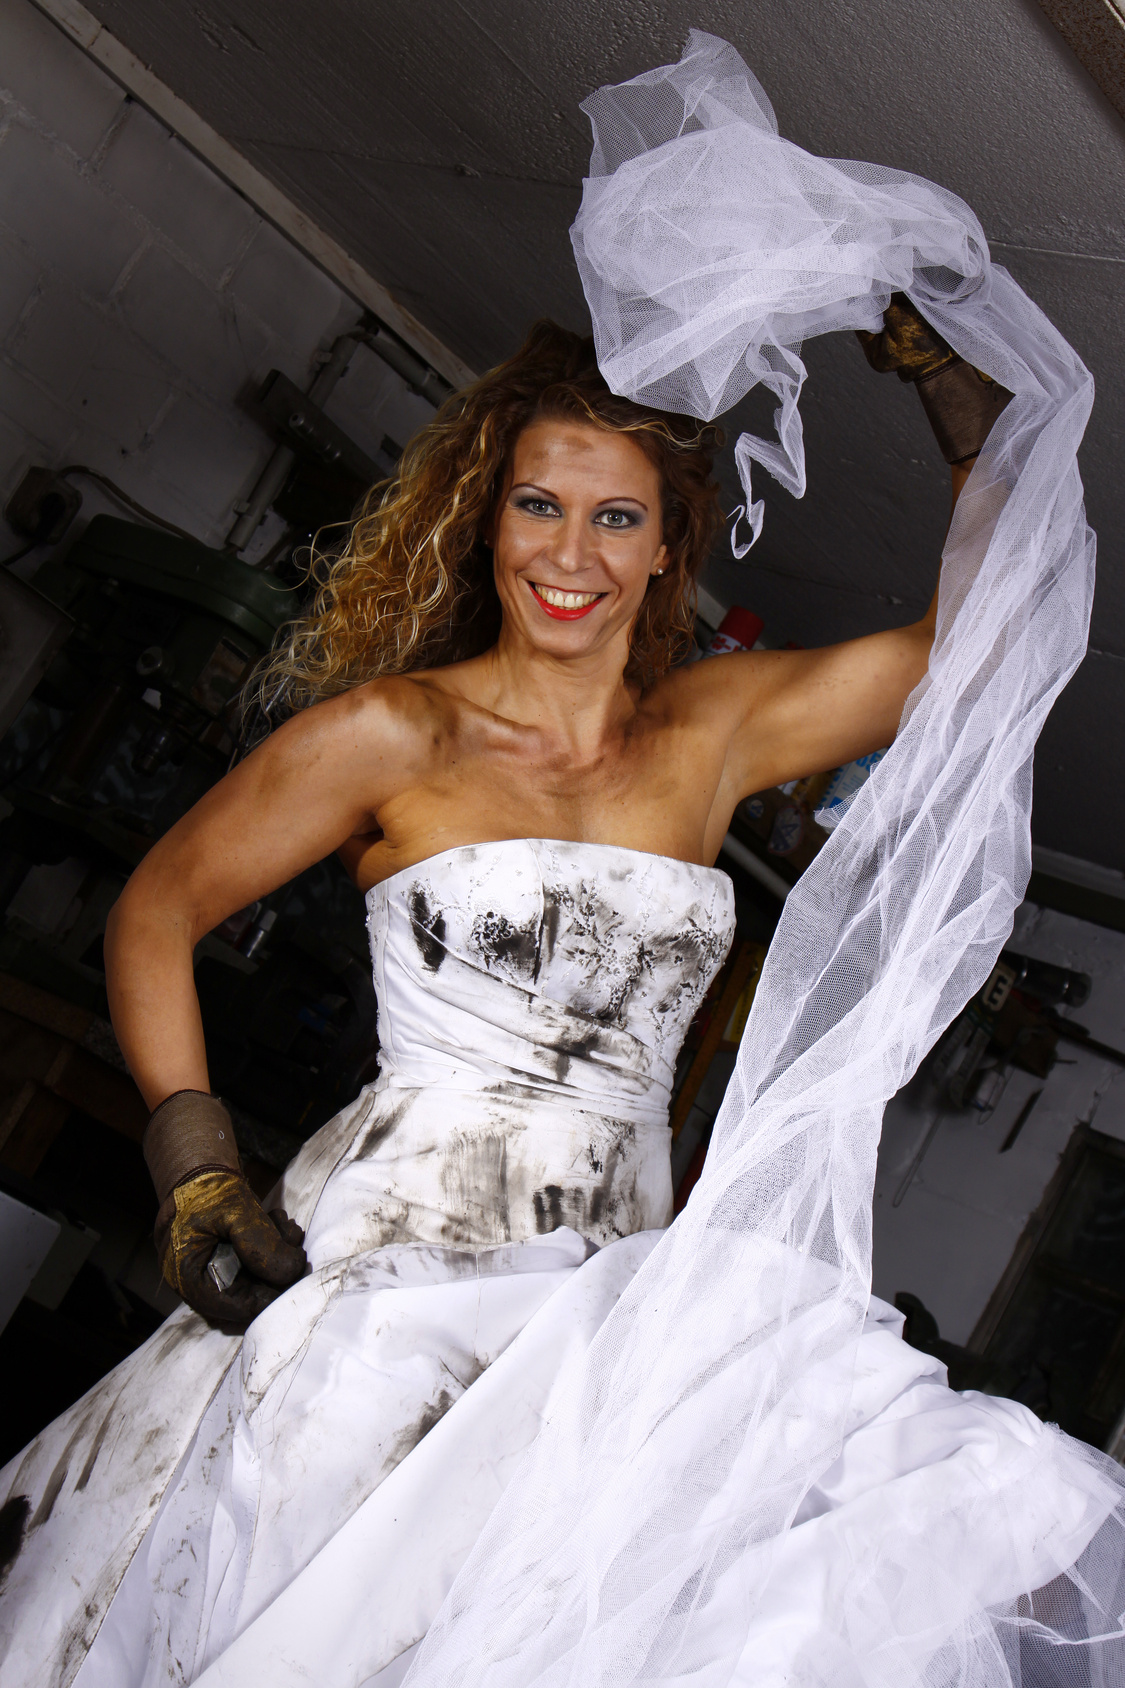 Davids Bridal - Used Clothing